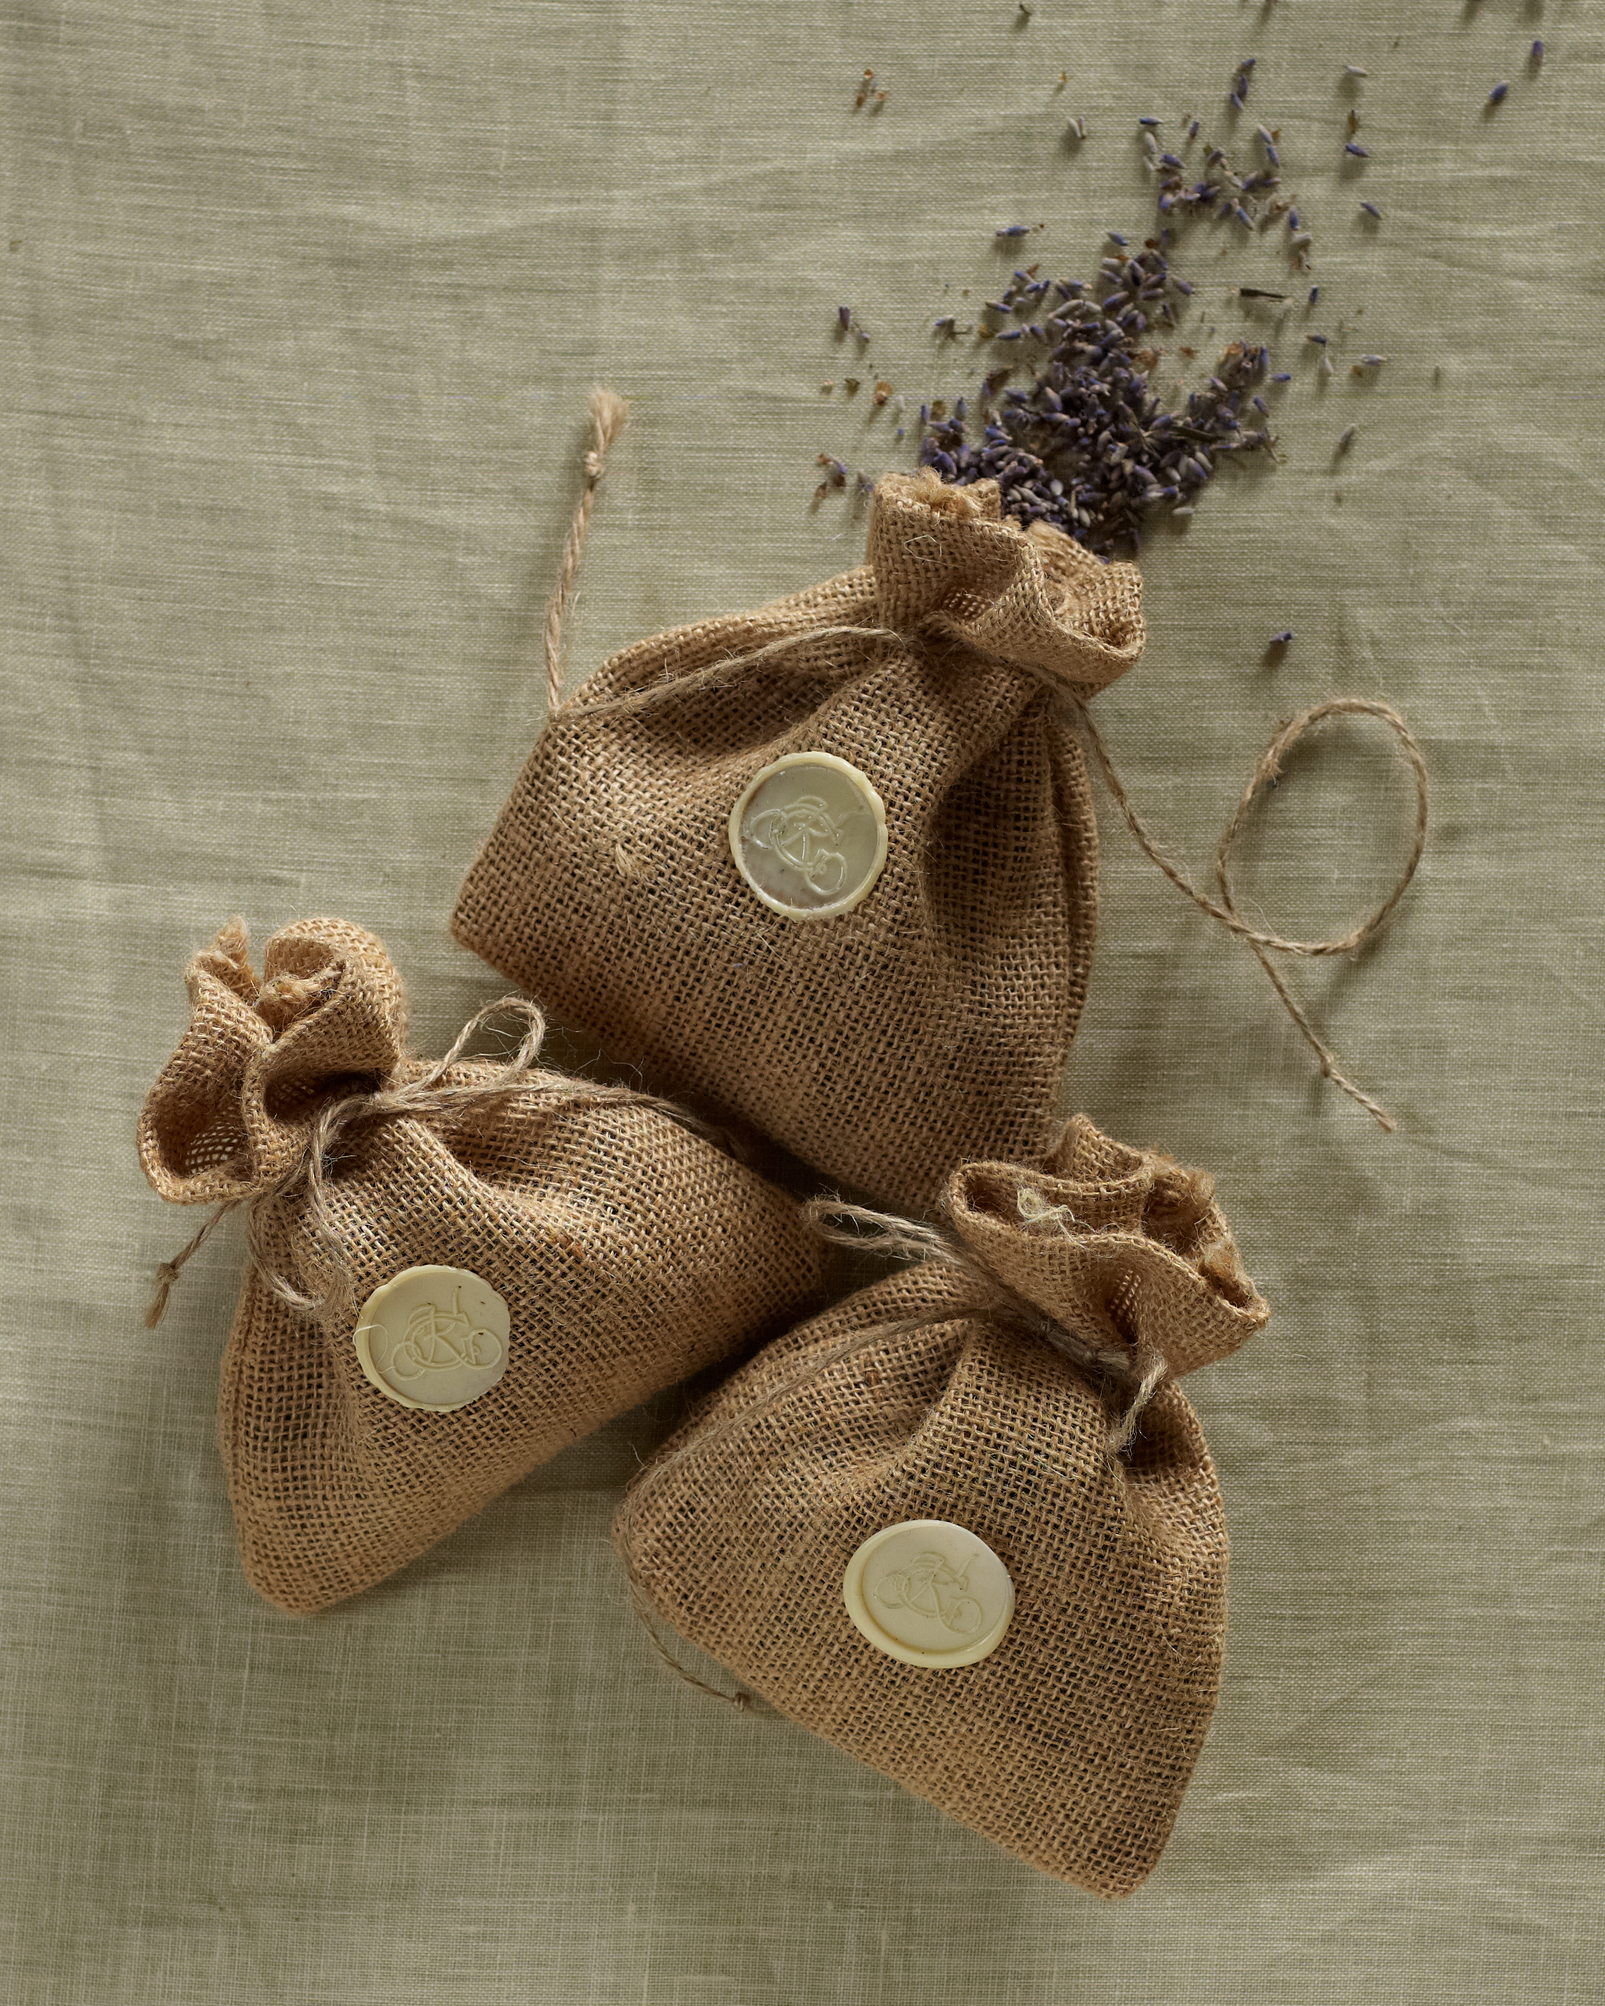 kennedy-gregory-lavender-016-d108943.jpg